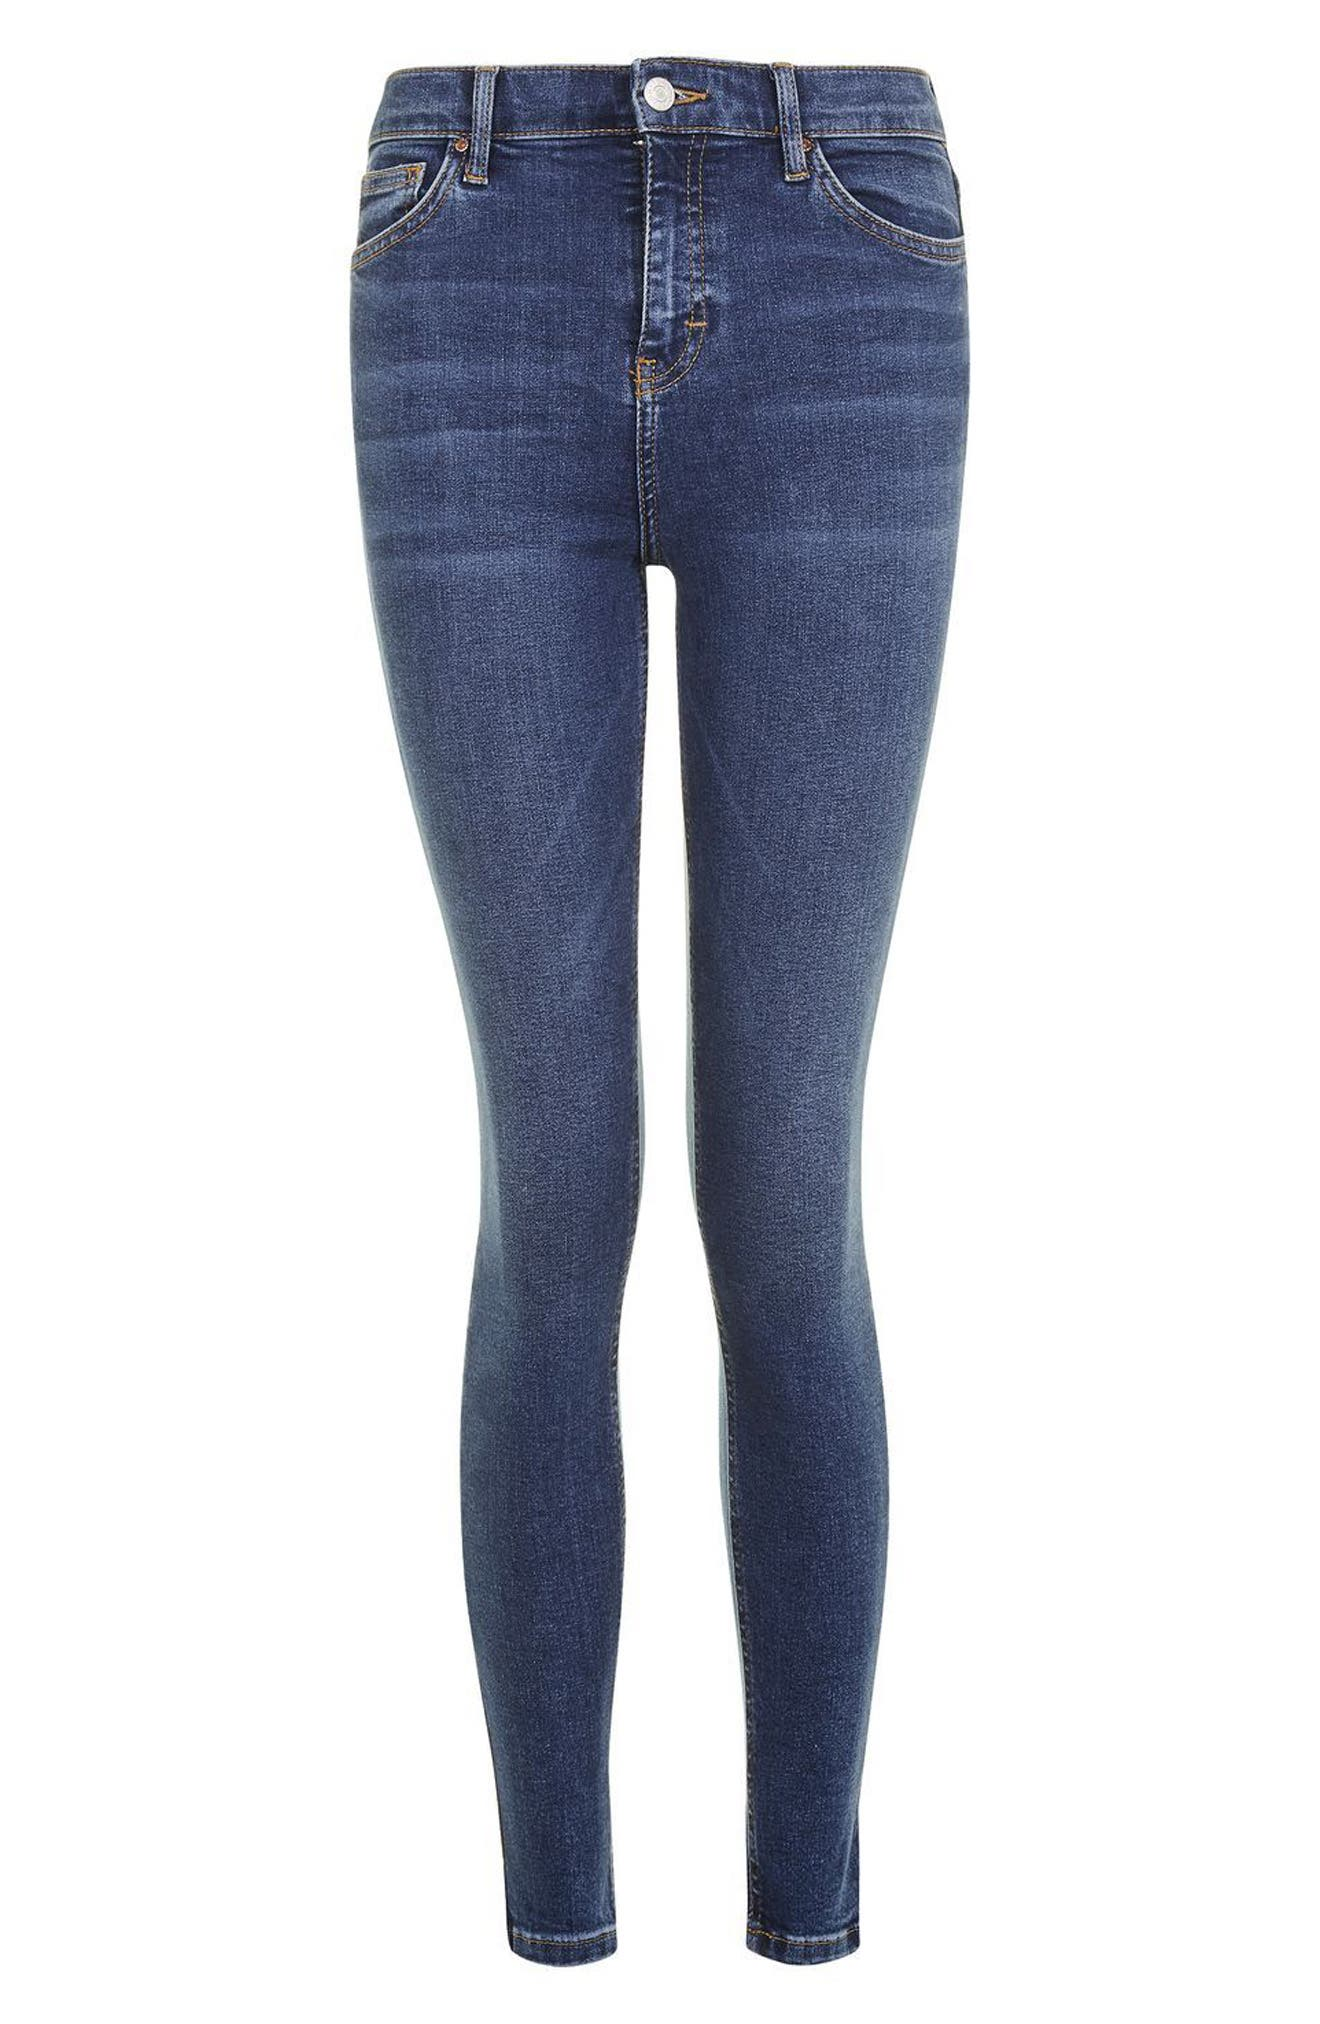 Topshop Indigo High Waist Skinny Jeans